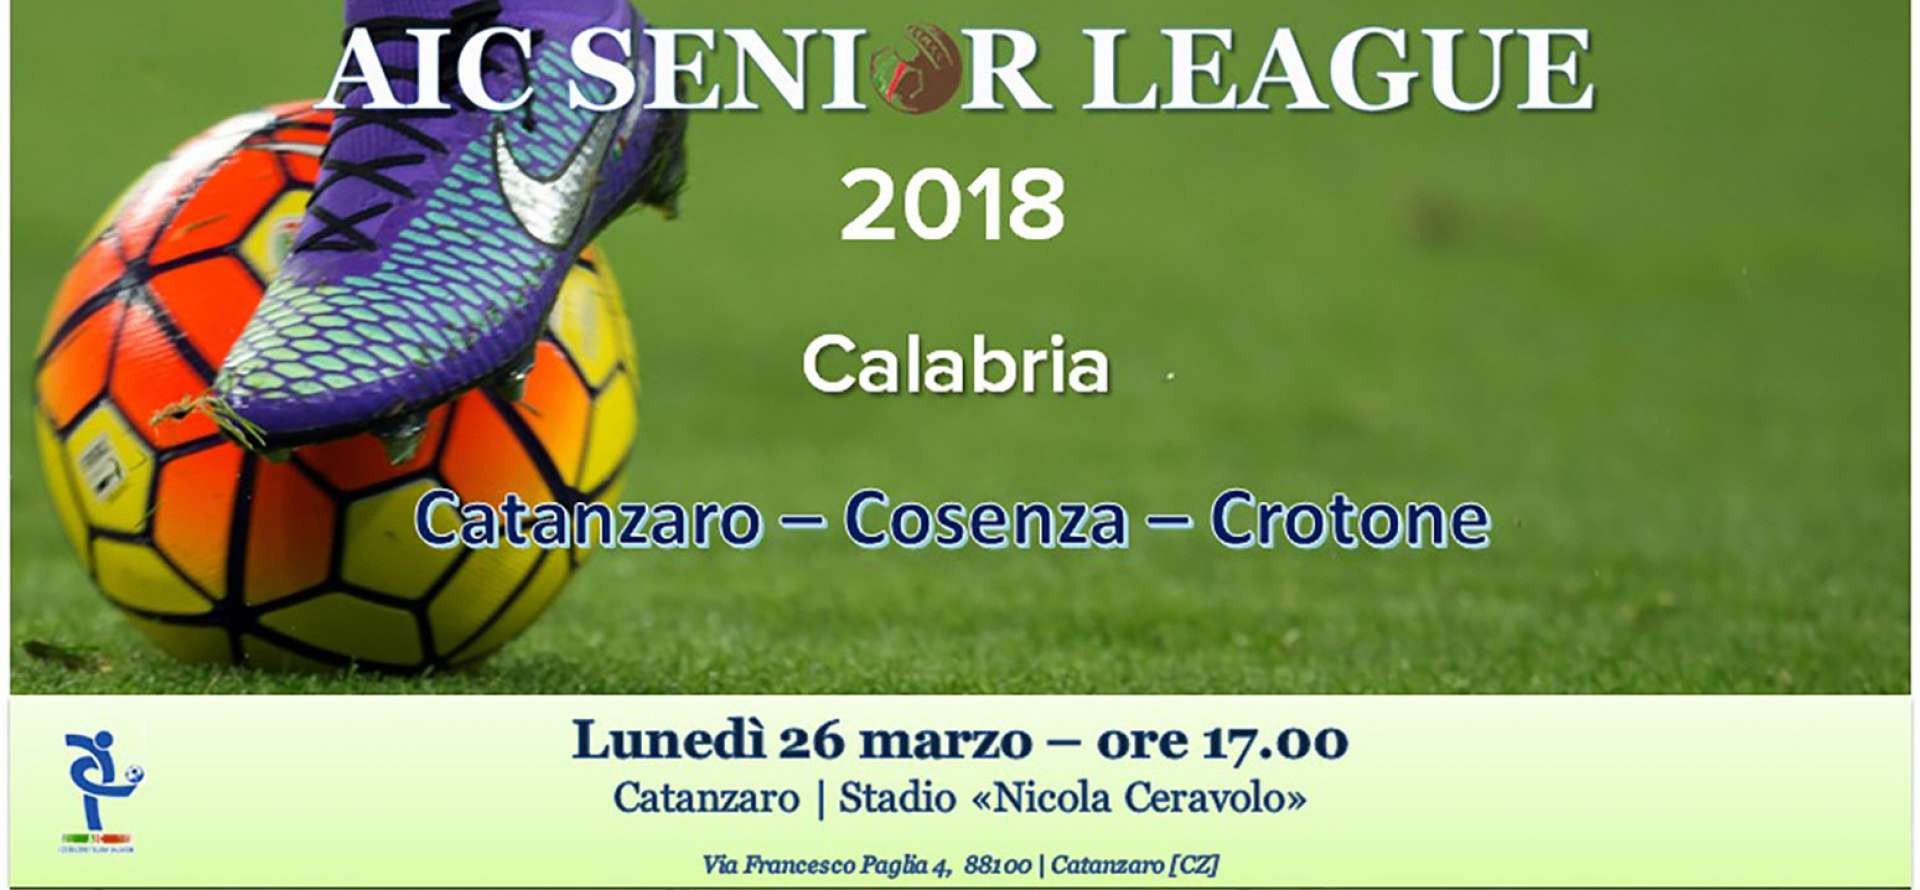 AIC Senior League, AIC, Associazione Italiana Calciatori, Catanzaro